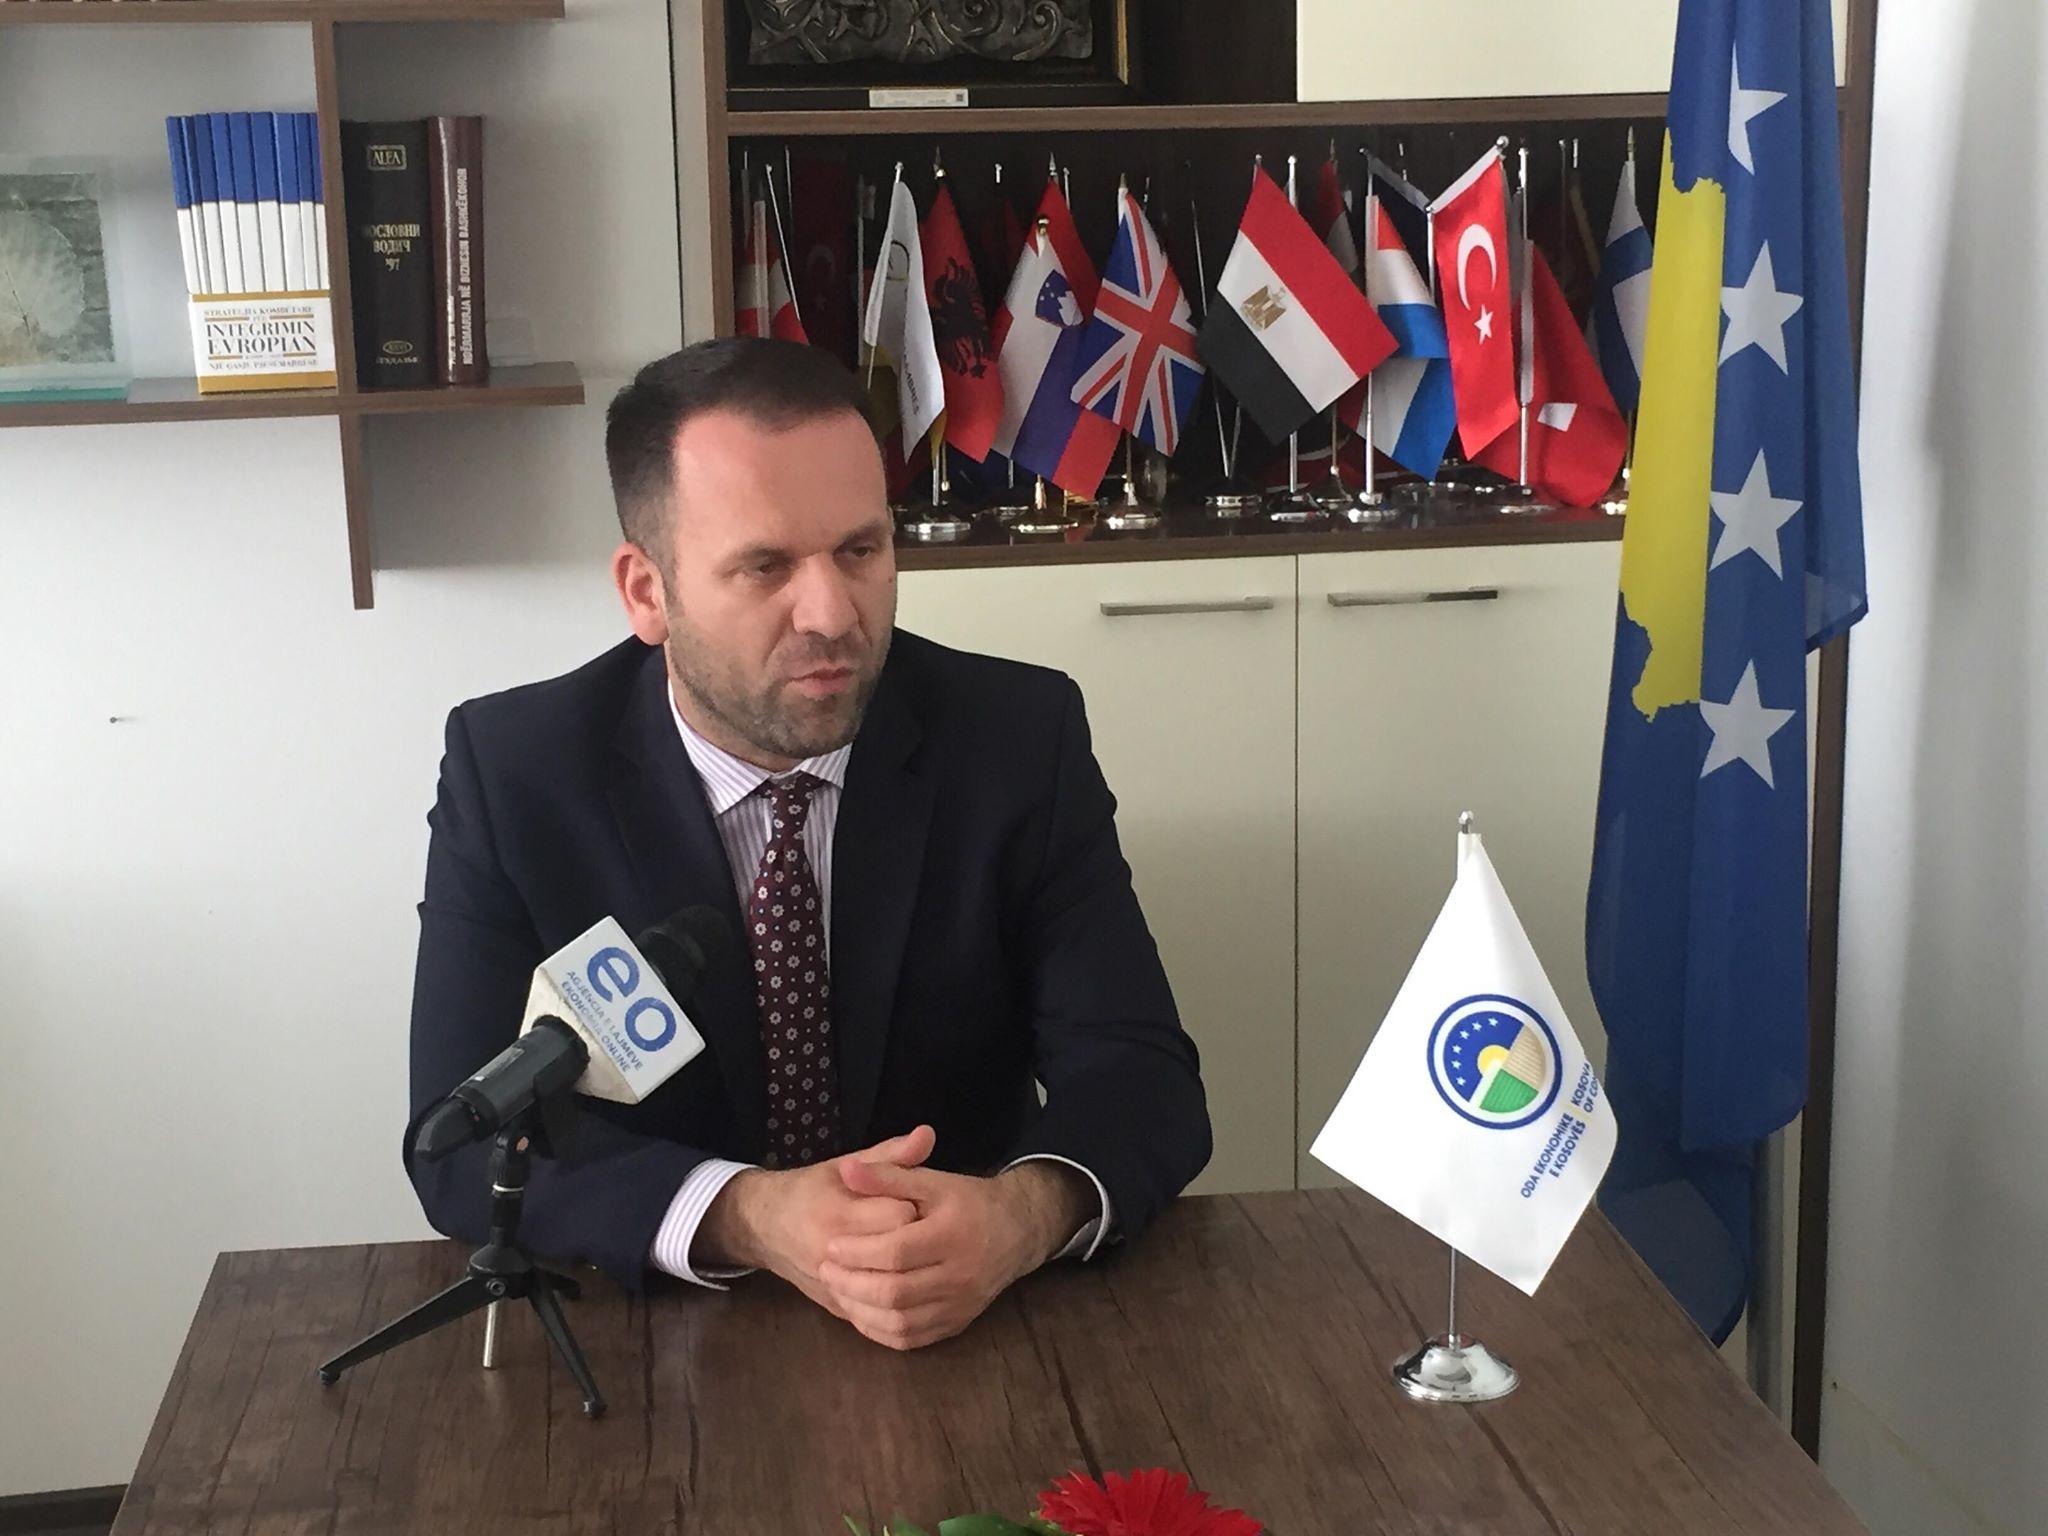 kryetari-i-ri-i-oek-ut-akuzon-bb-ne-per-vonim-te-termocentralit-kosova-e-re-e-paarsyeshme-terheqja